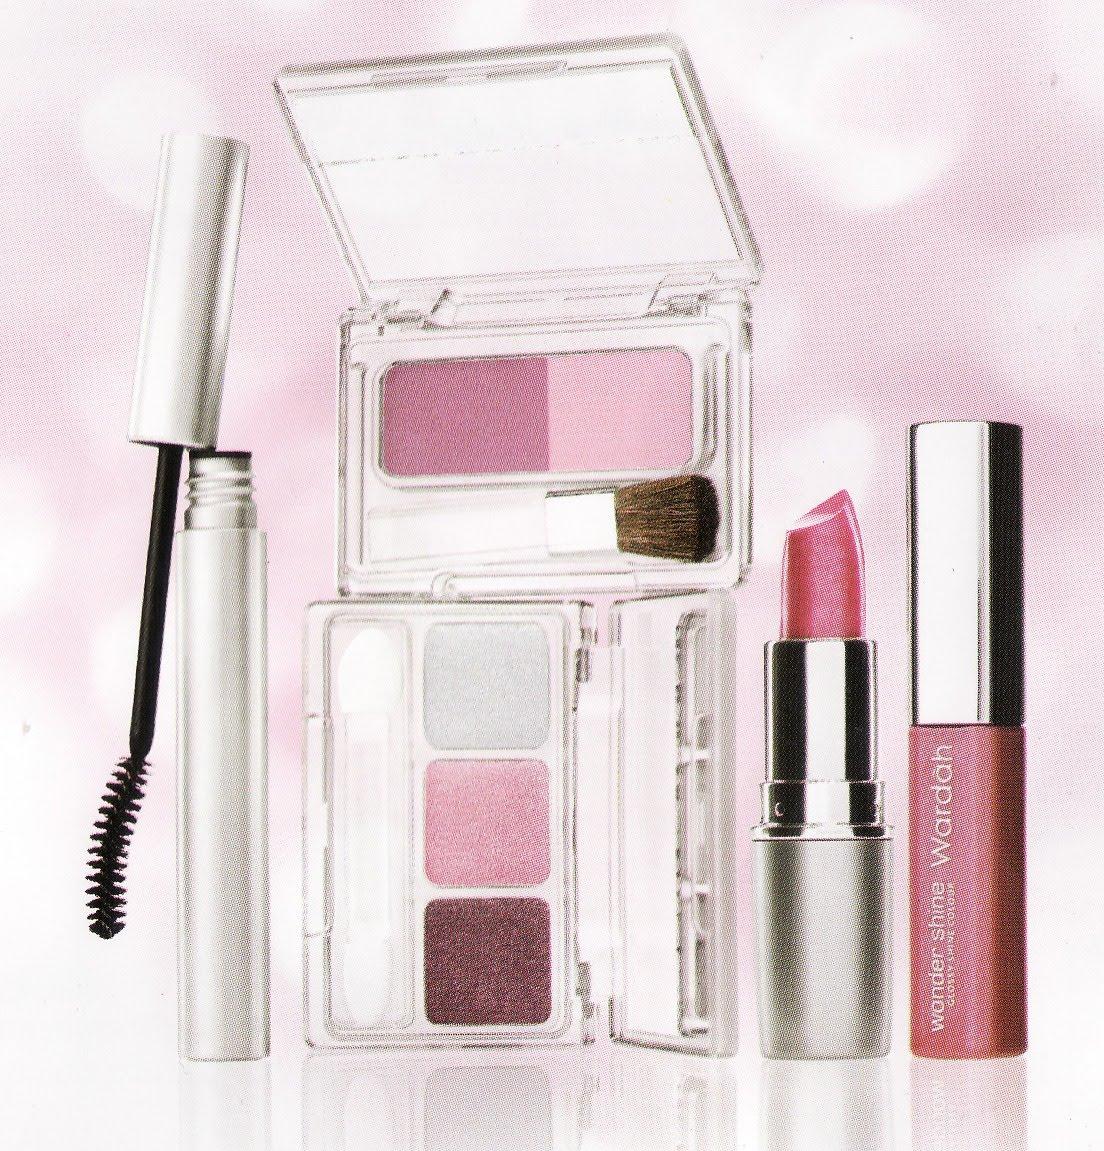 Toko Kosmetik Halal Daftar Harga Produk Wardah Cosmetics